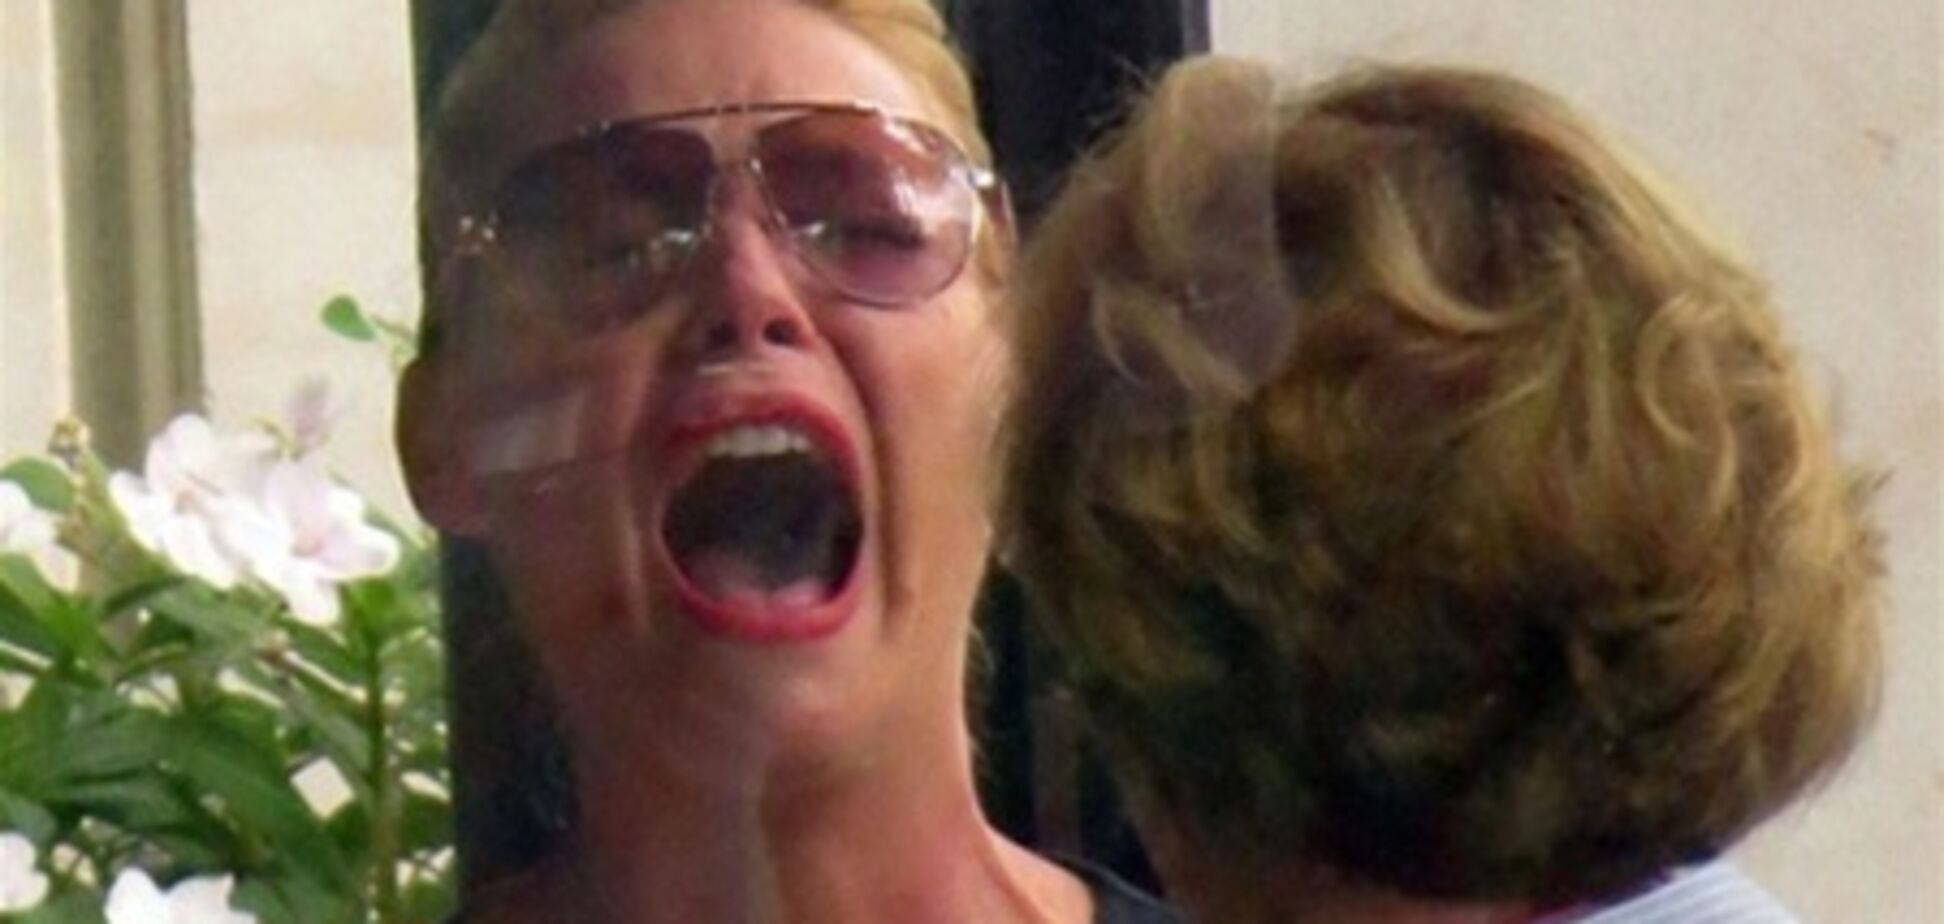 Кэтрин Хейгл закатила истерику в ресторане